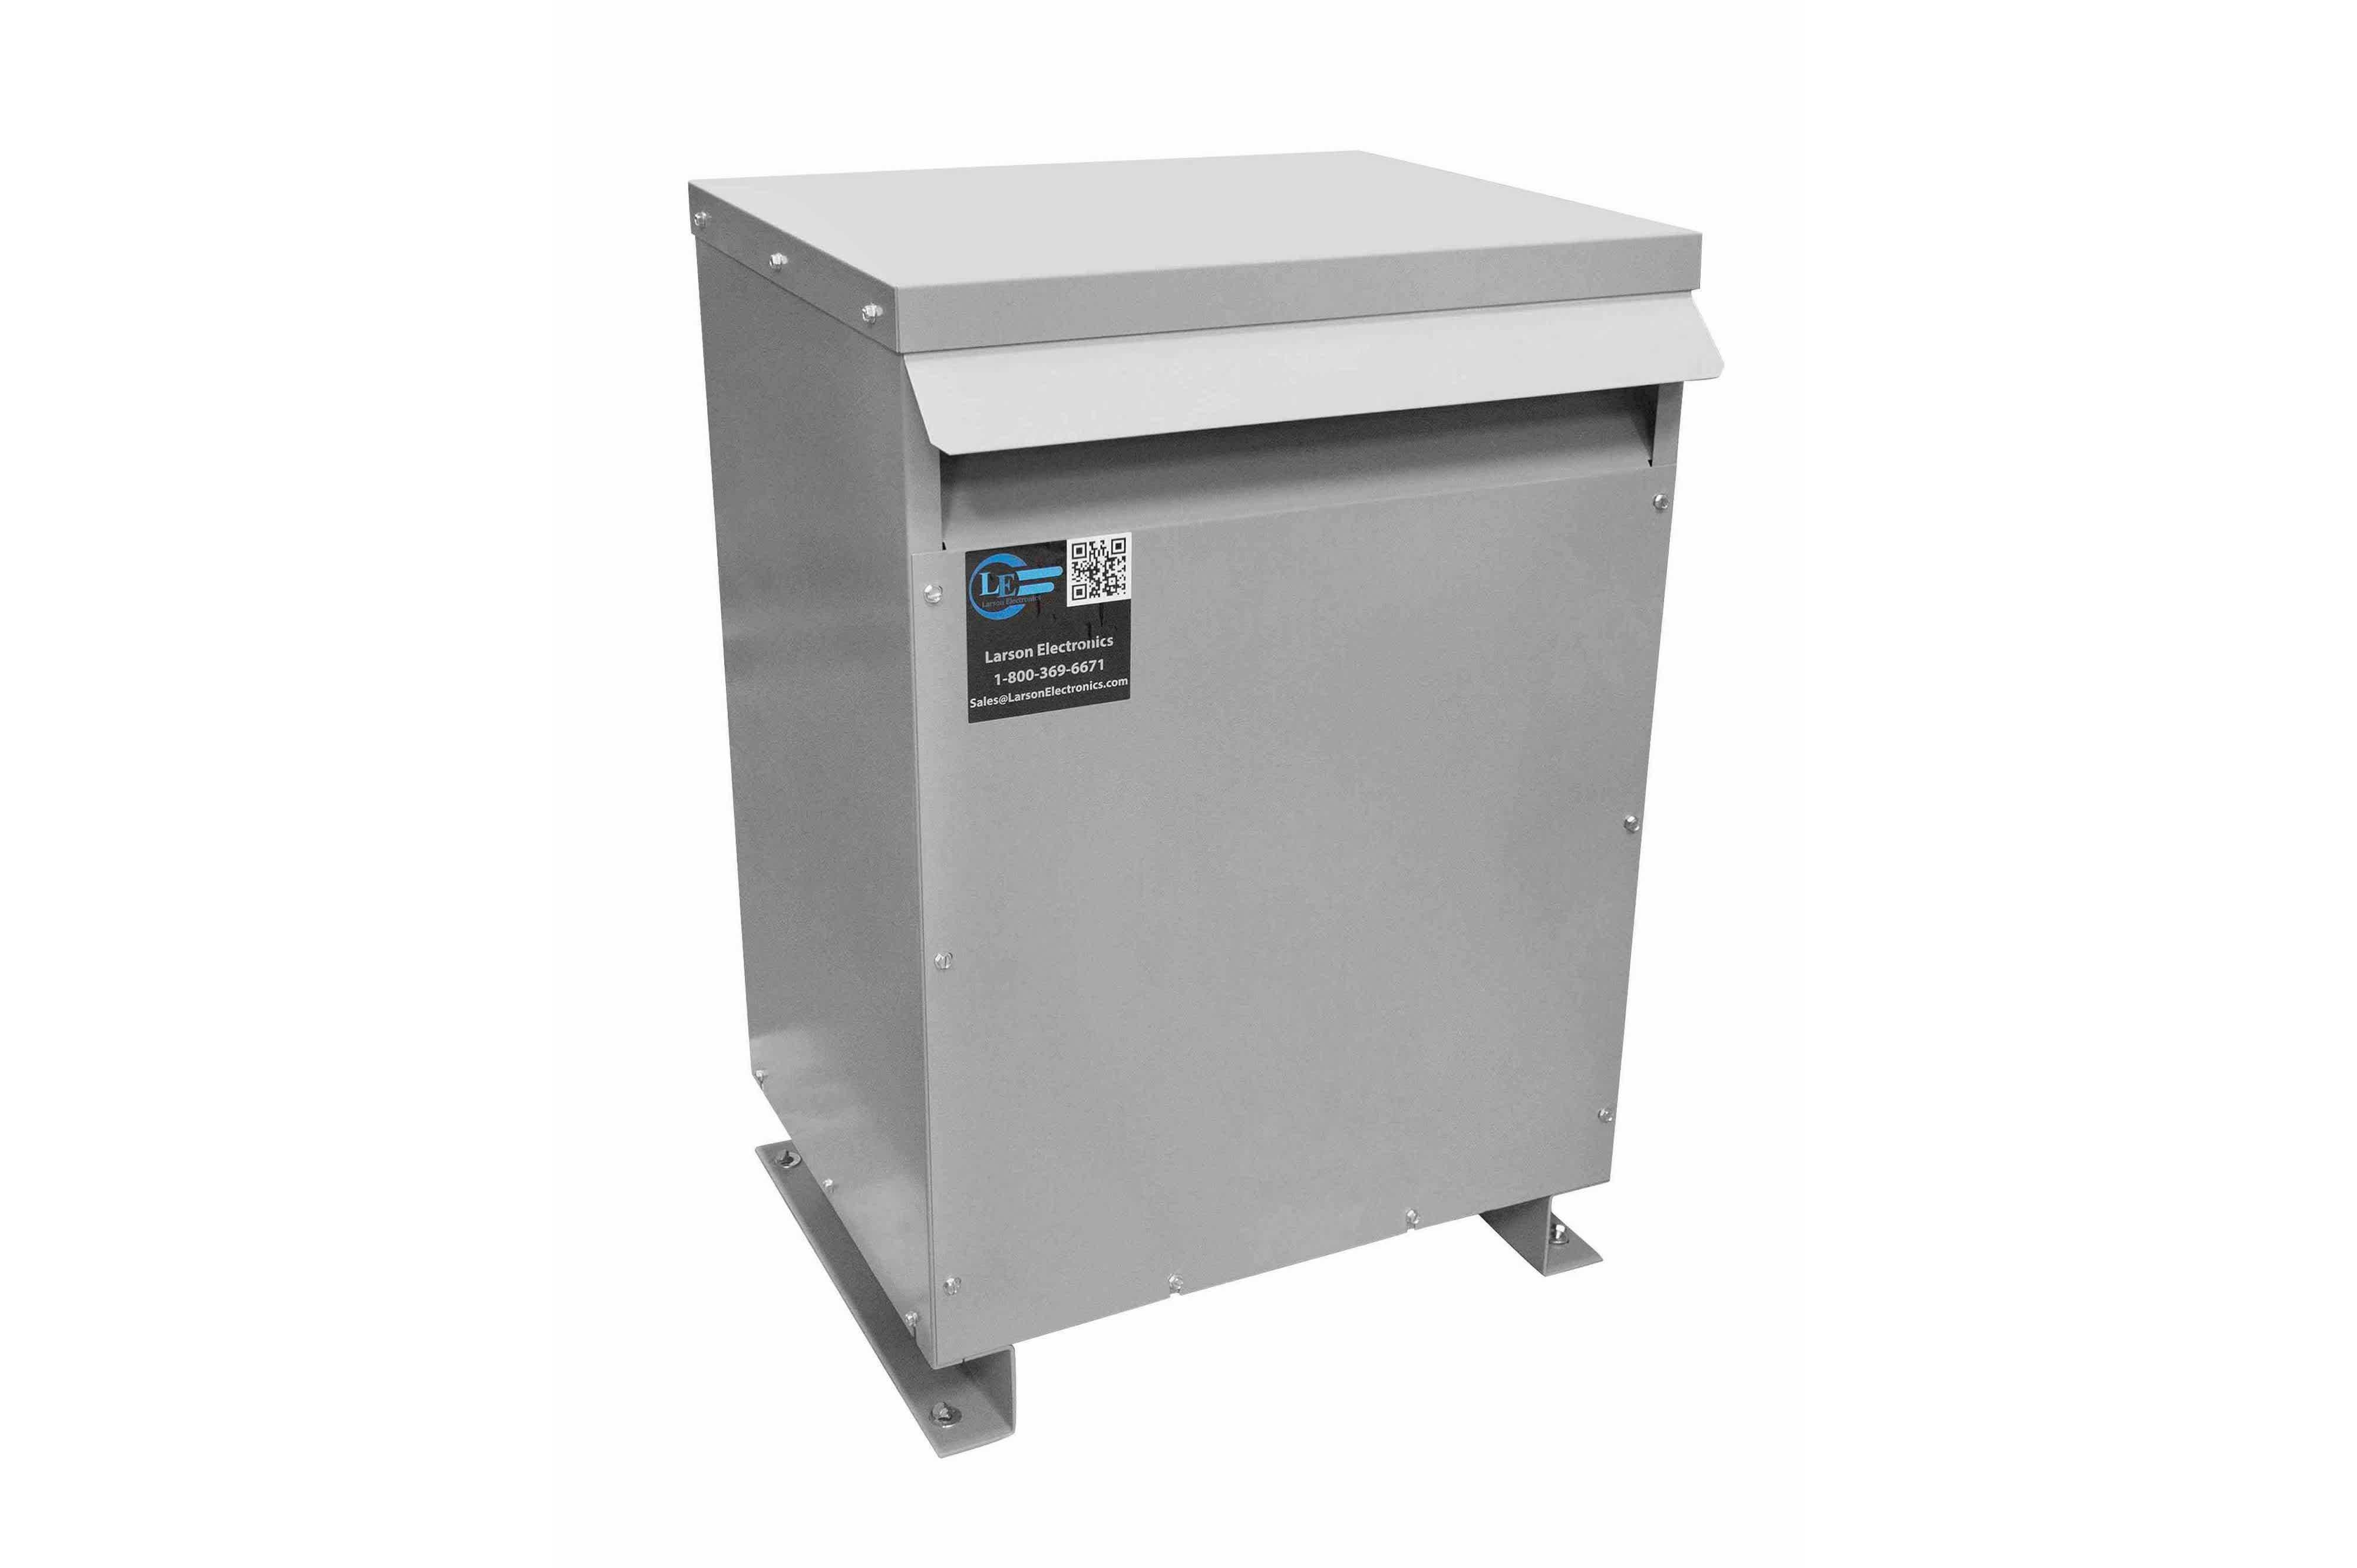 50 kVA 3PH Isolation Transformer, 575V Wye Primary, 240V/120 Delta Secondary, N3R, Ventilated, 60 Hz